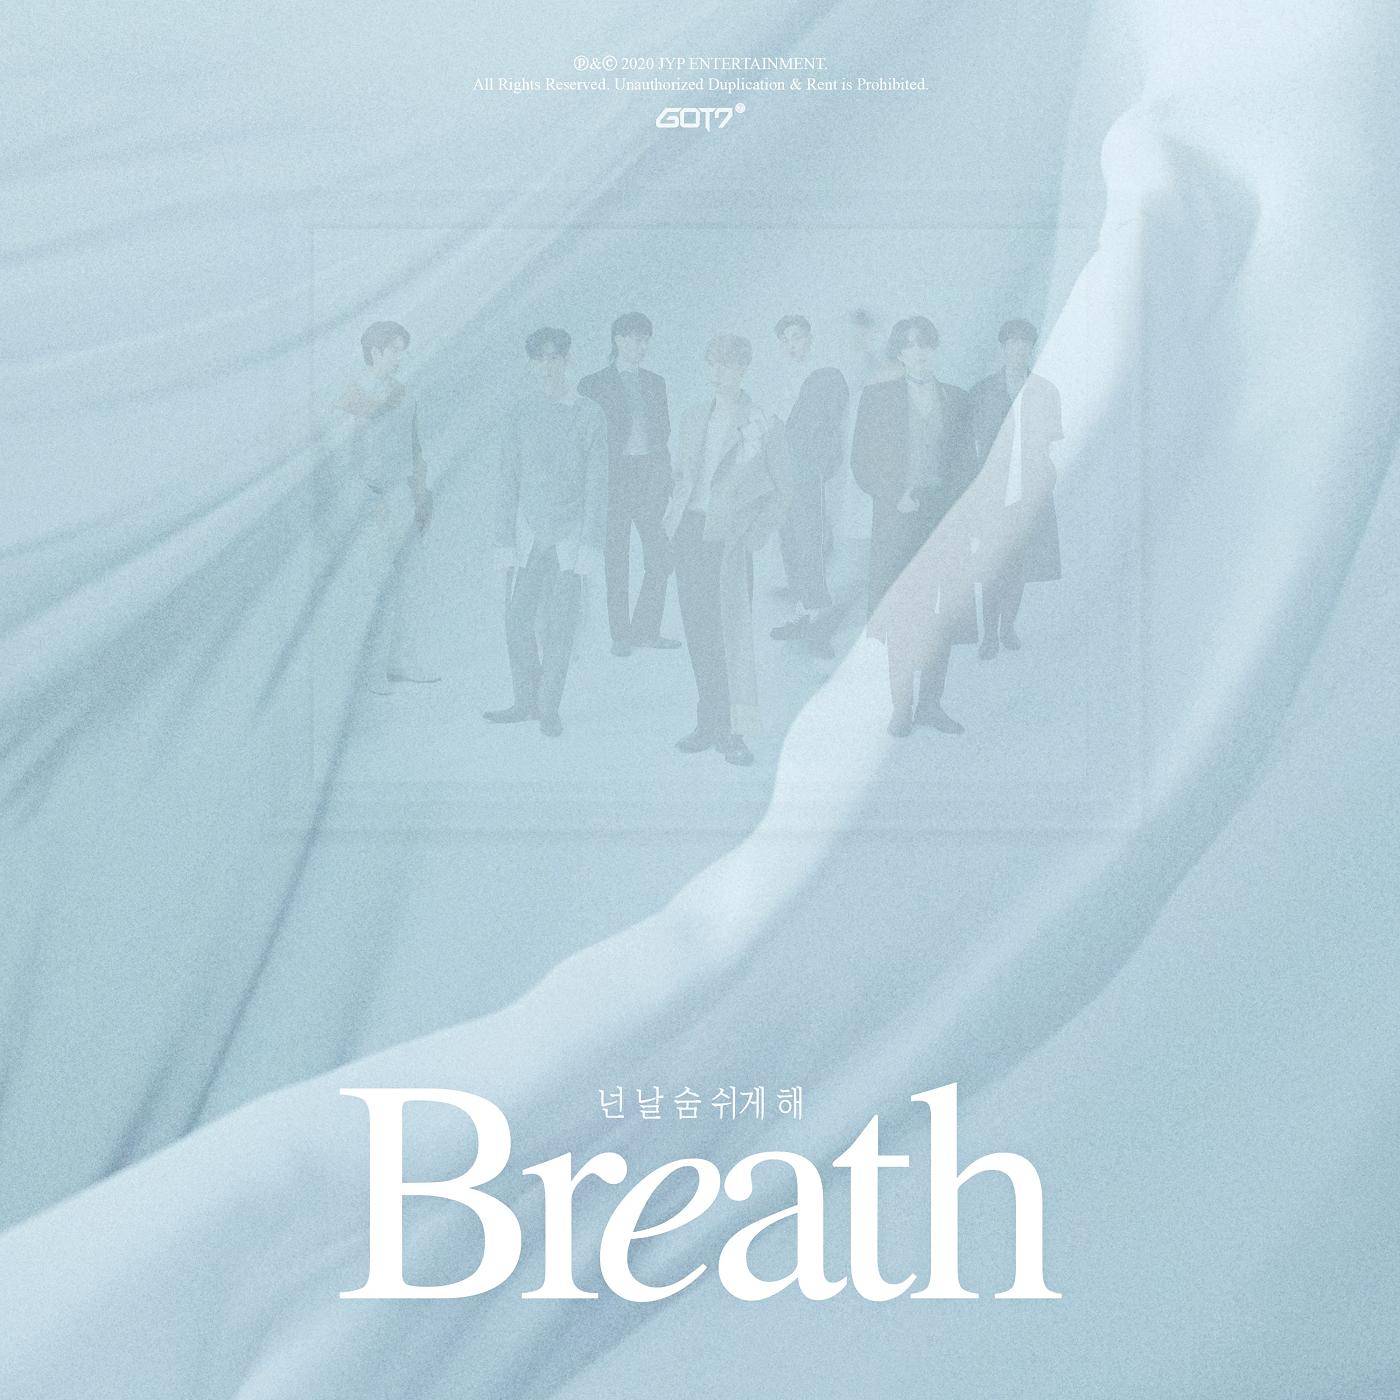 Breath (GOT7)